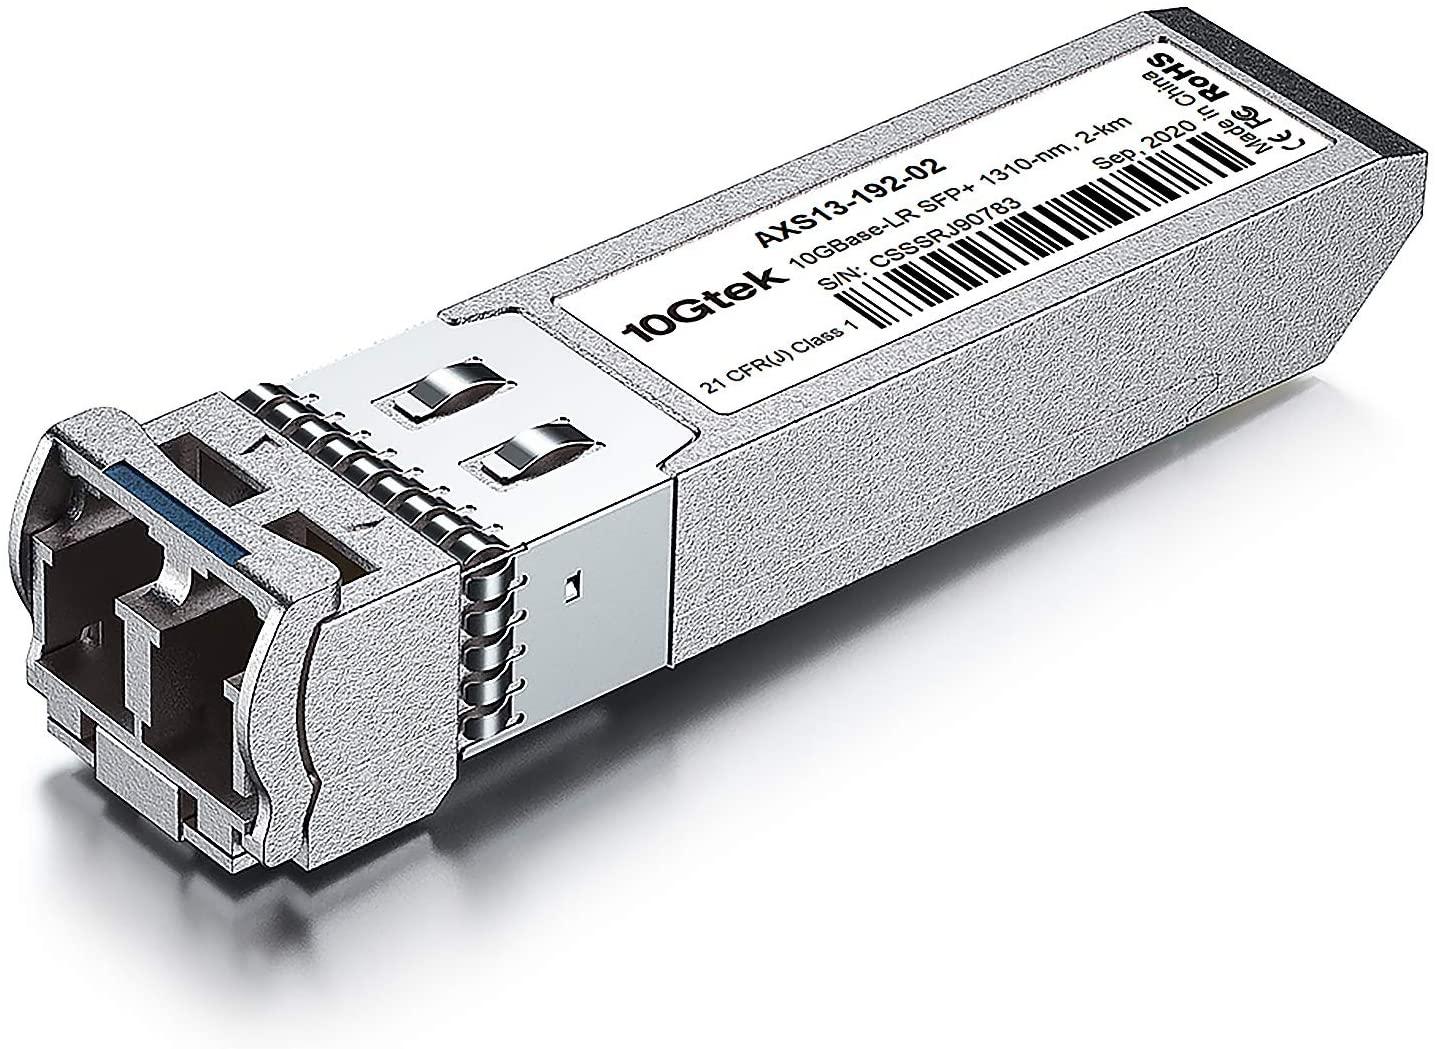 10GBase-LR Lite SFP+ IR Transceiver, 10G 1310nm SMF, up to 2 km, Compatible with Cisco